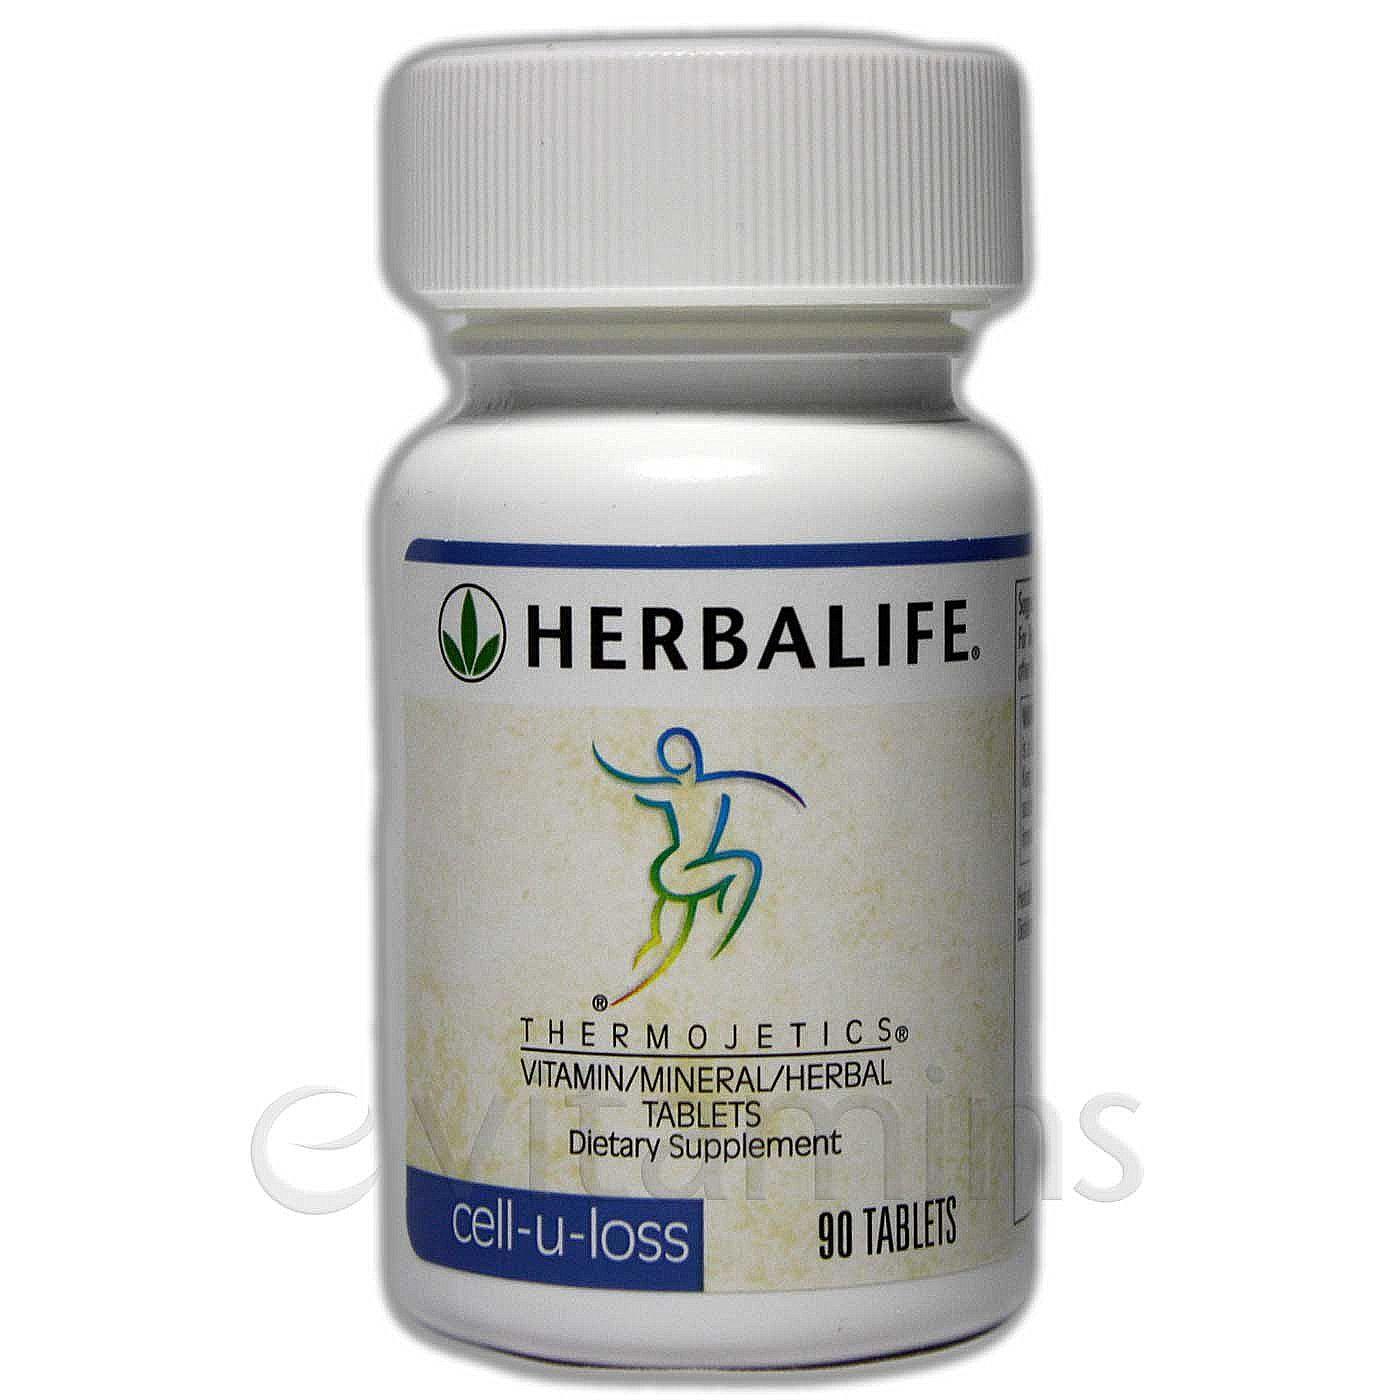 Herbalife Cell-U-Loss, Original - 90 Tablets - eVitamins Canada